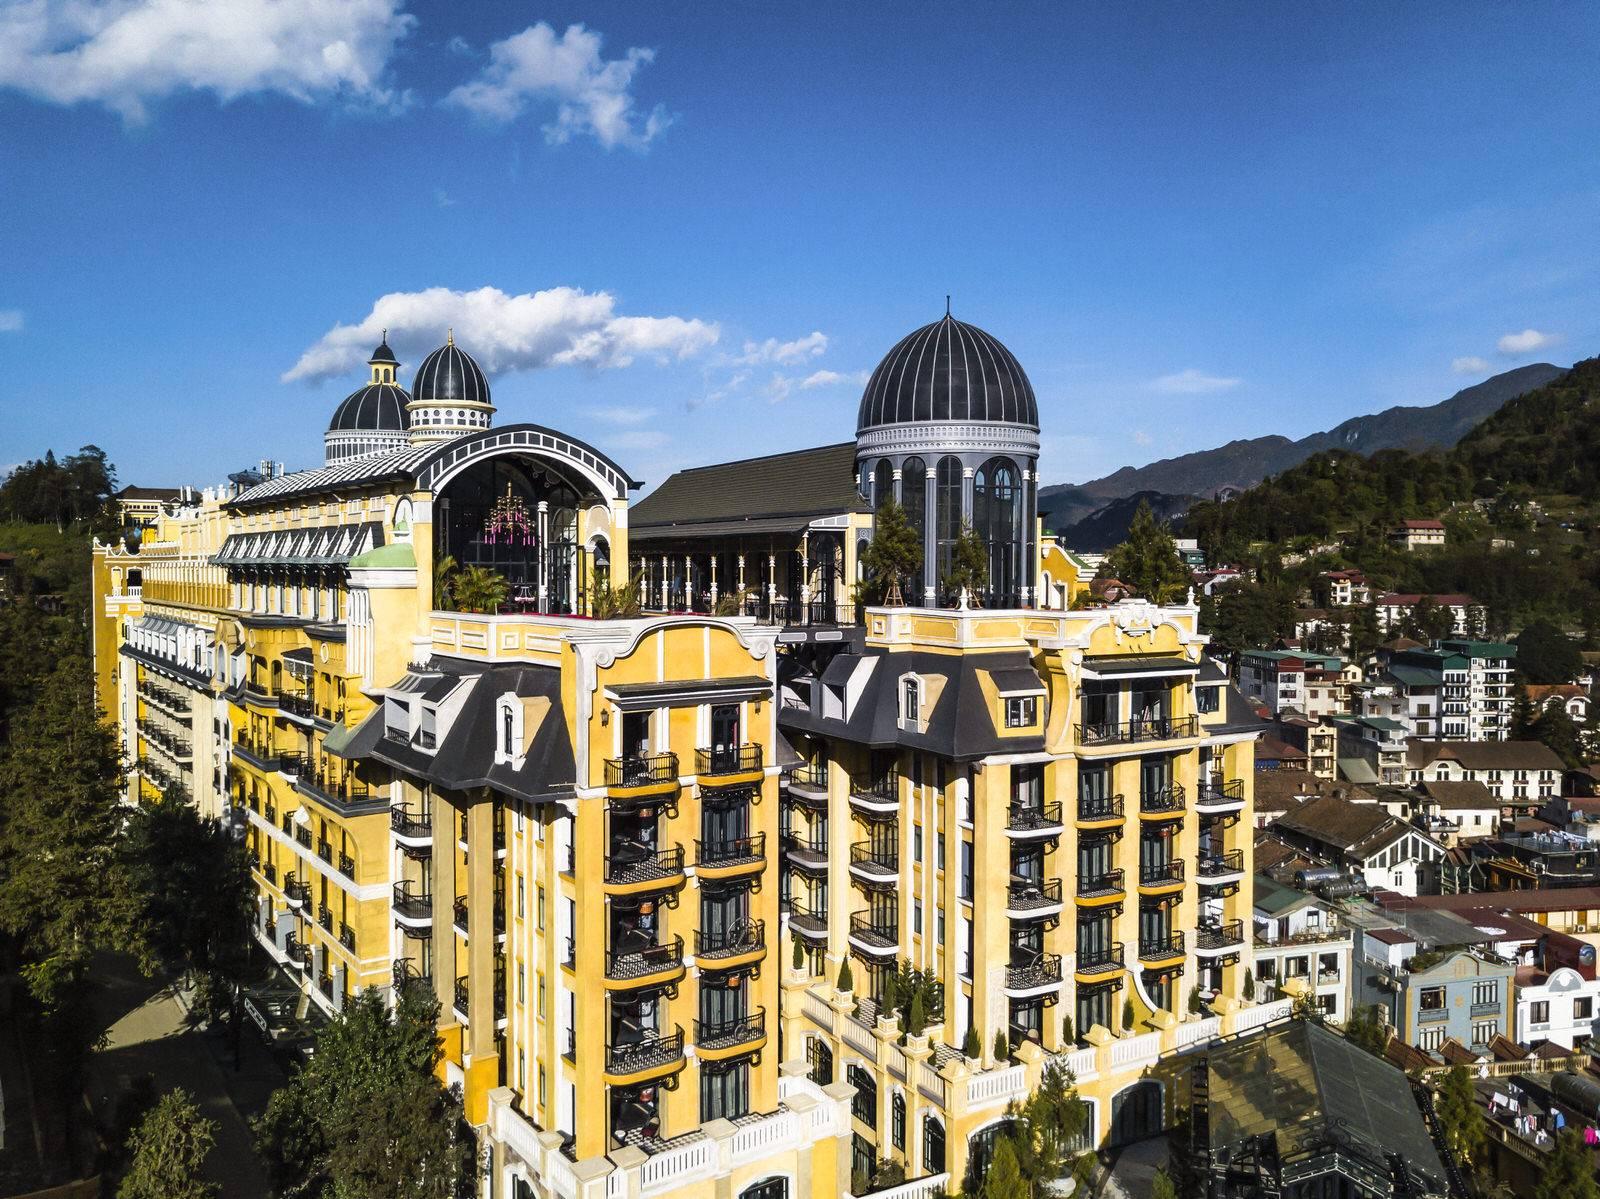 Kiến trúc Pháp tuyệt đẹp của Hotel De La Coupole Sapa